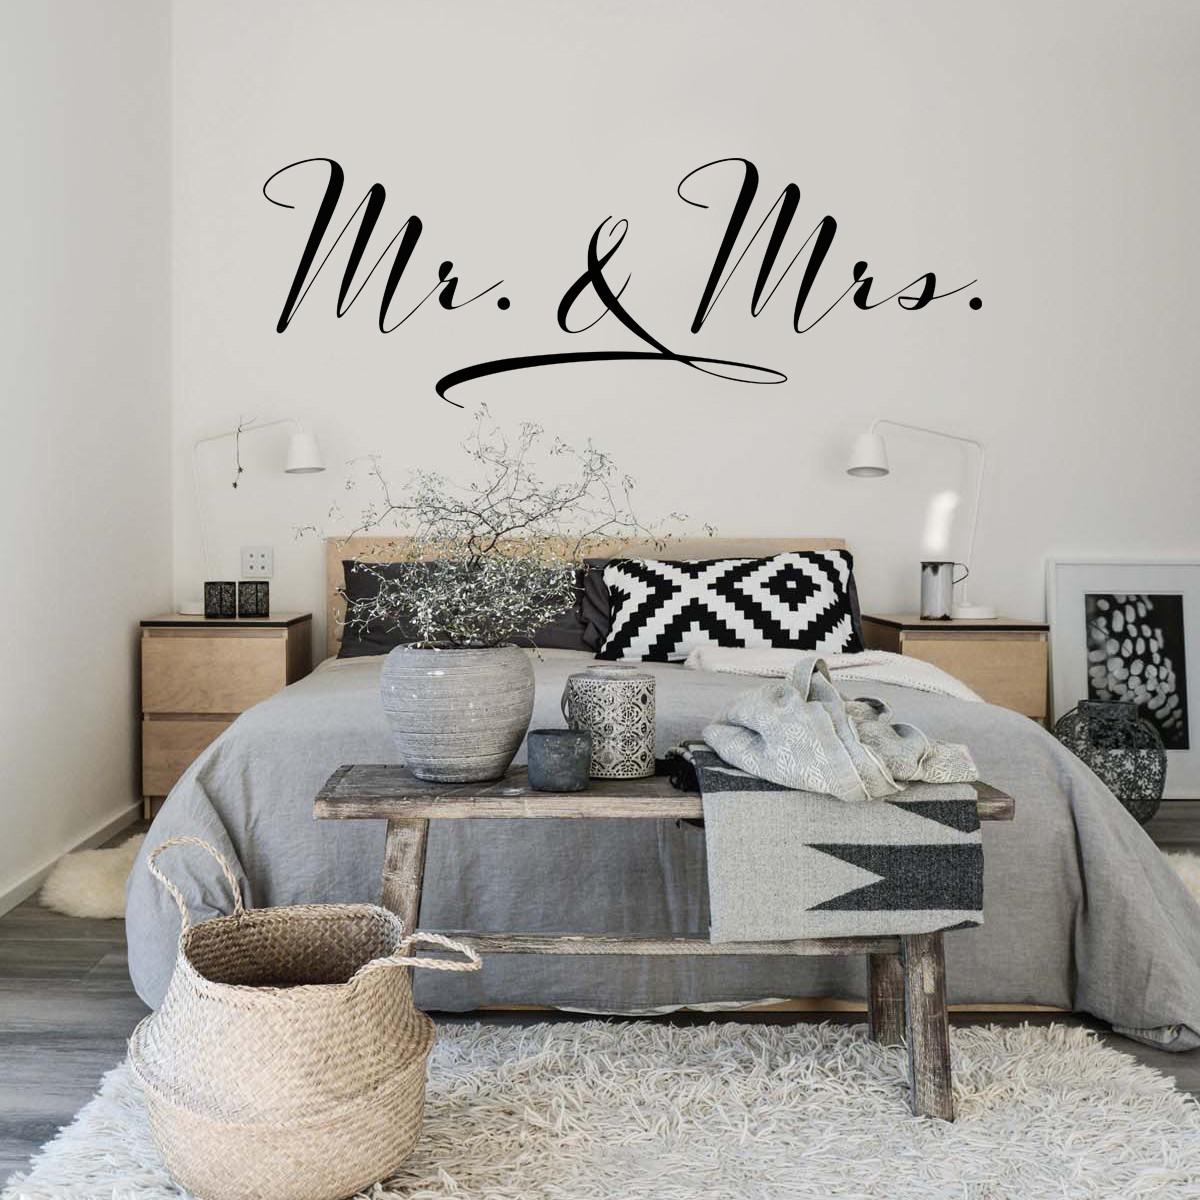 HOUSEDECOR Mr. -  Mrs.